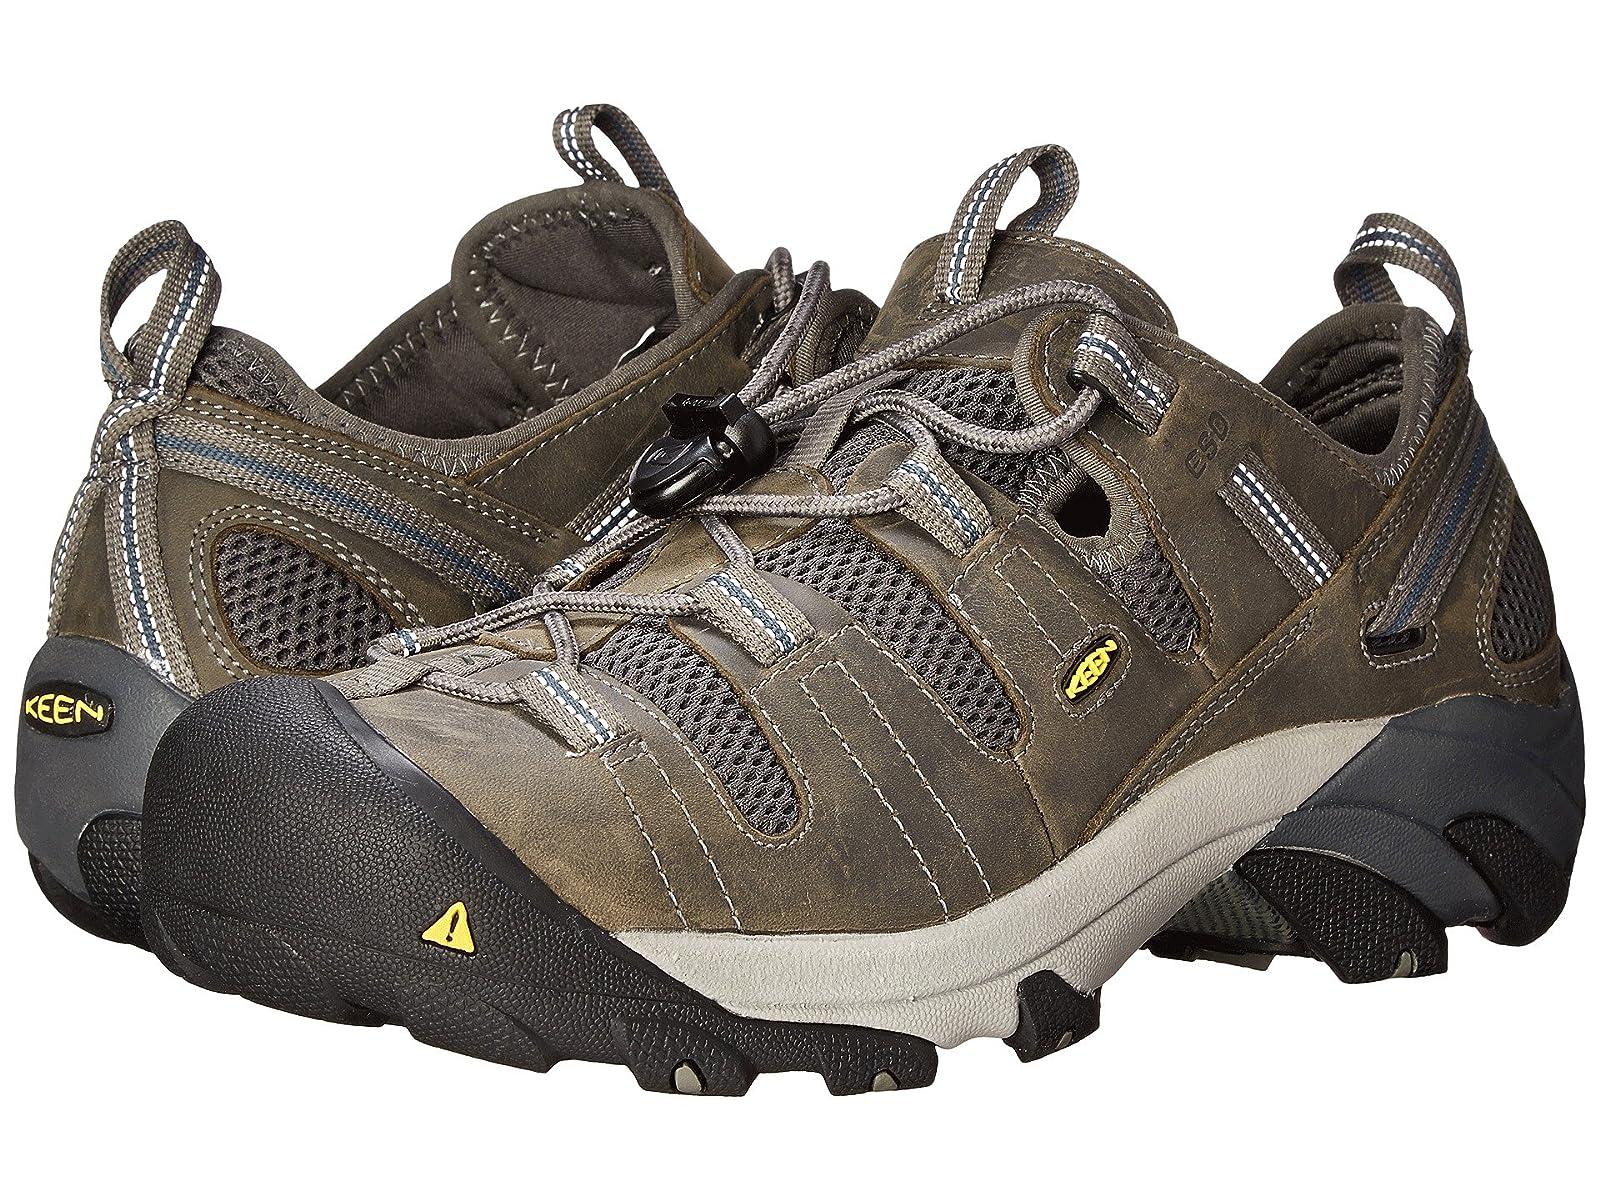 Keen Utility Atlanta CoolAtmospheric grades have affordable shoes